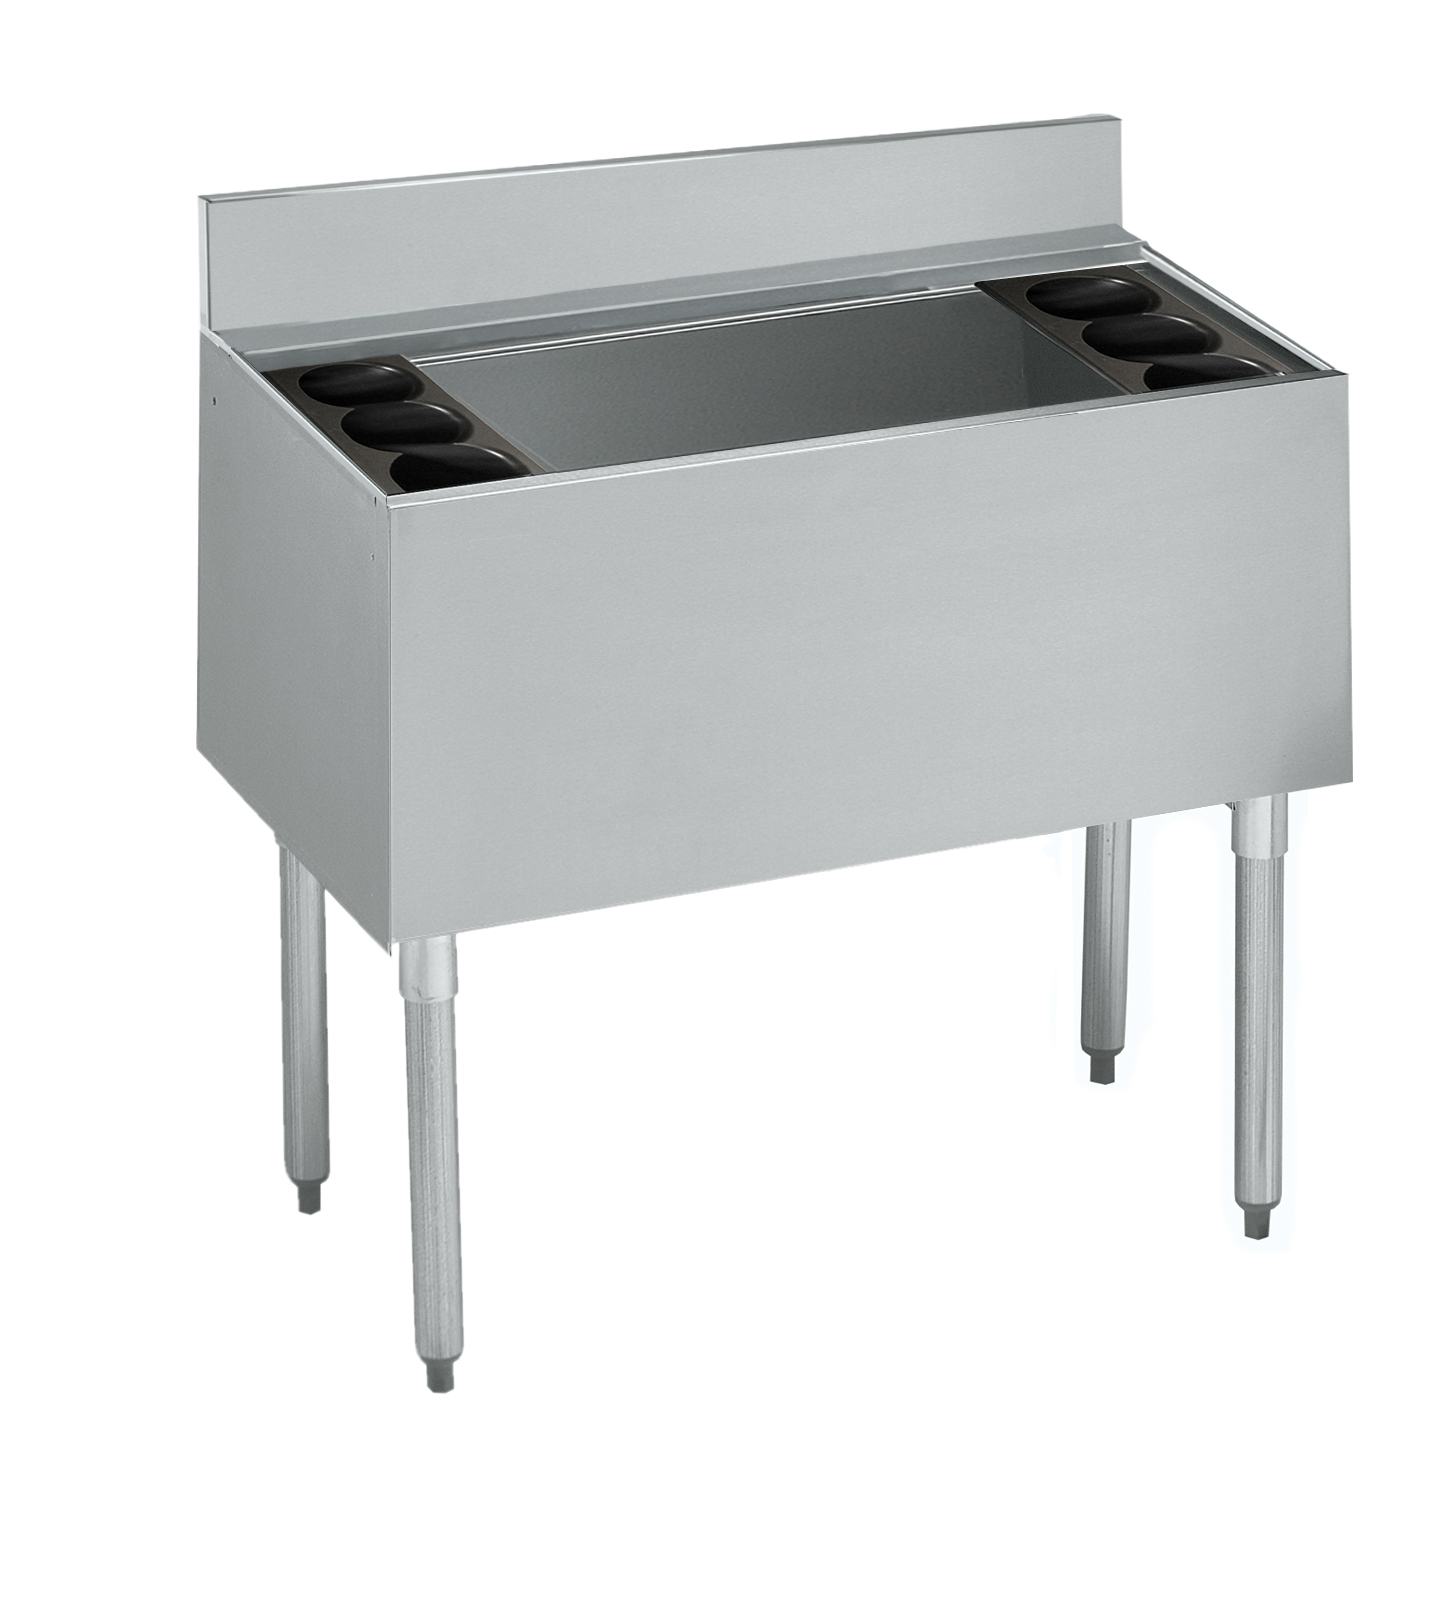 Krowne Metal 21-36DP underbar ice bin/cocktail unit